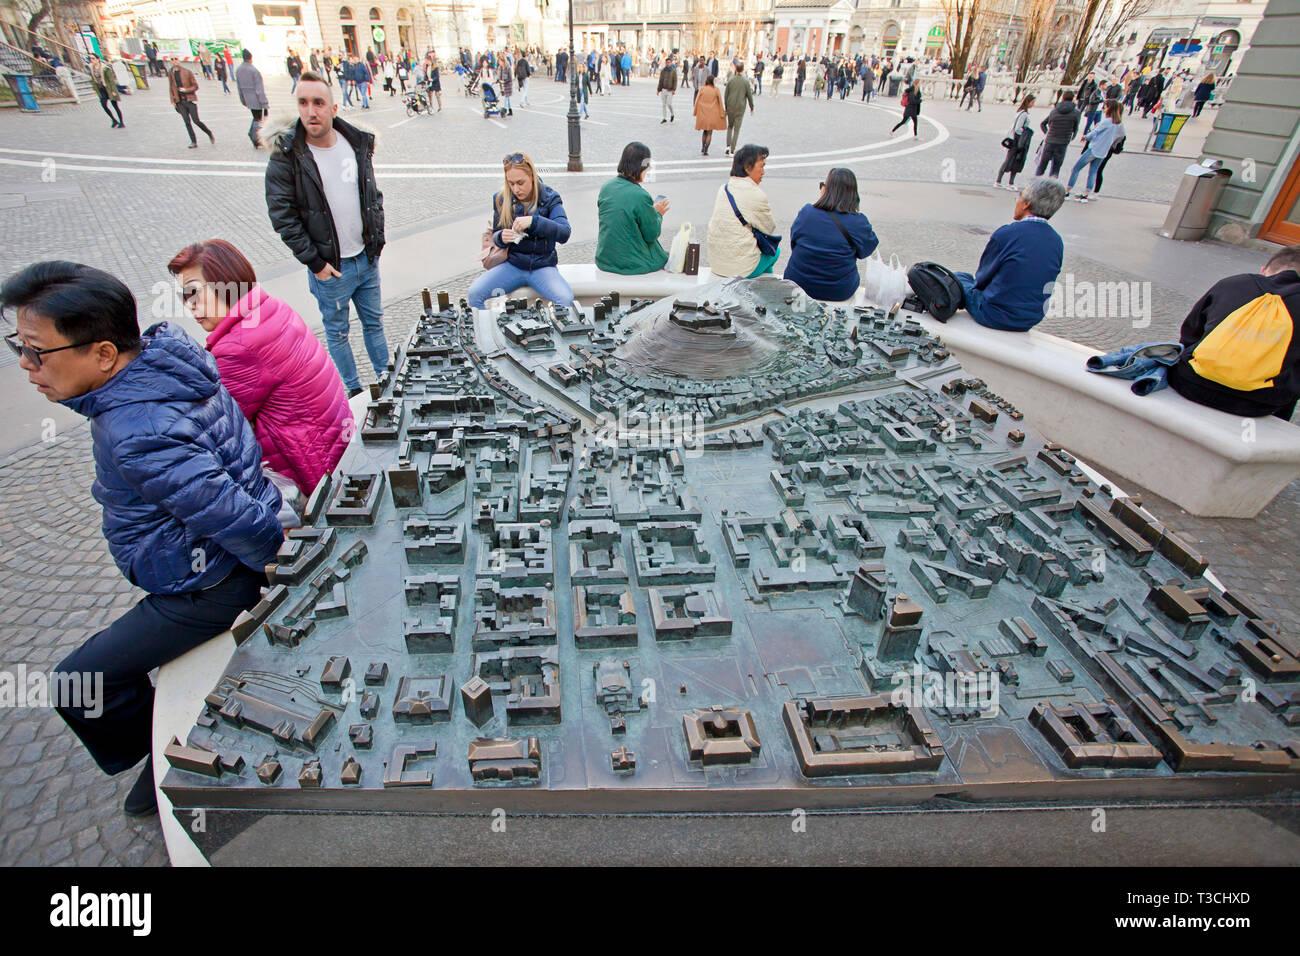 A giant metal map of Ljubljana - Stock Image